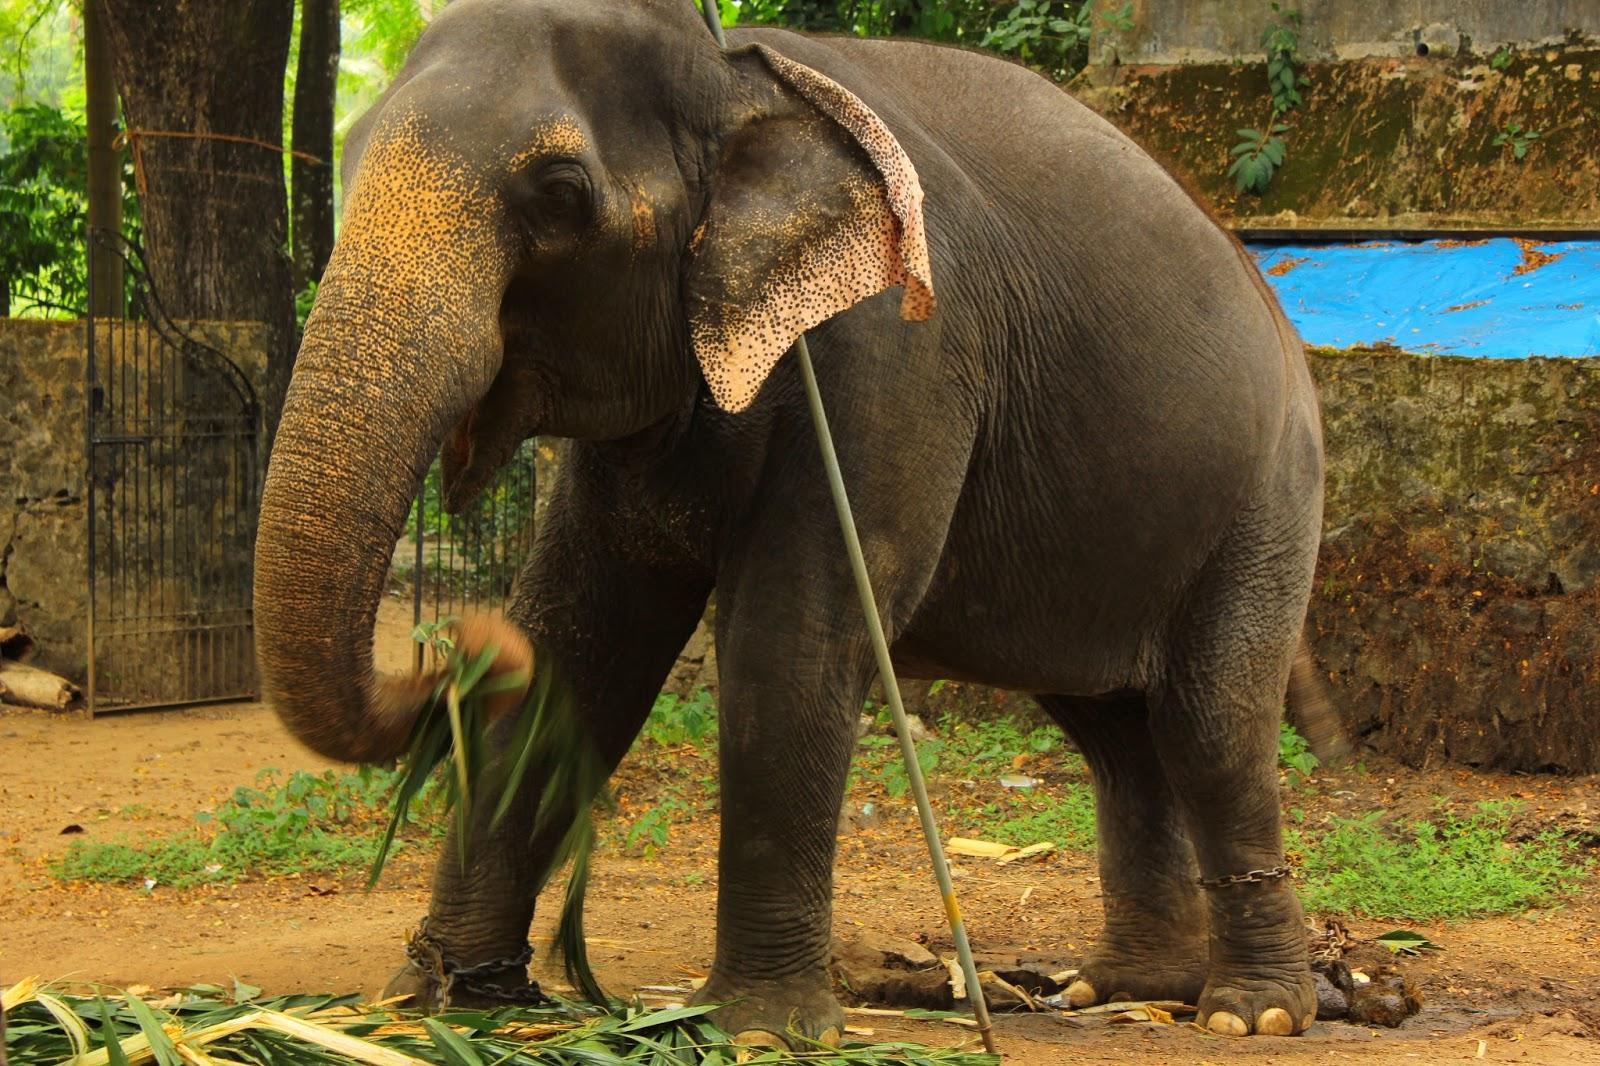 Elephants and Hindu temples,Kerala - Navrang India